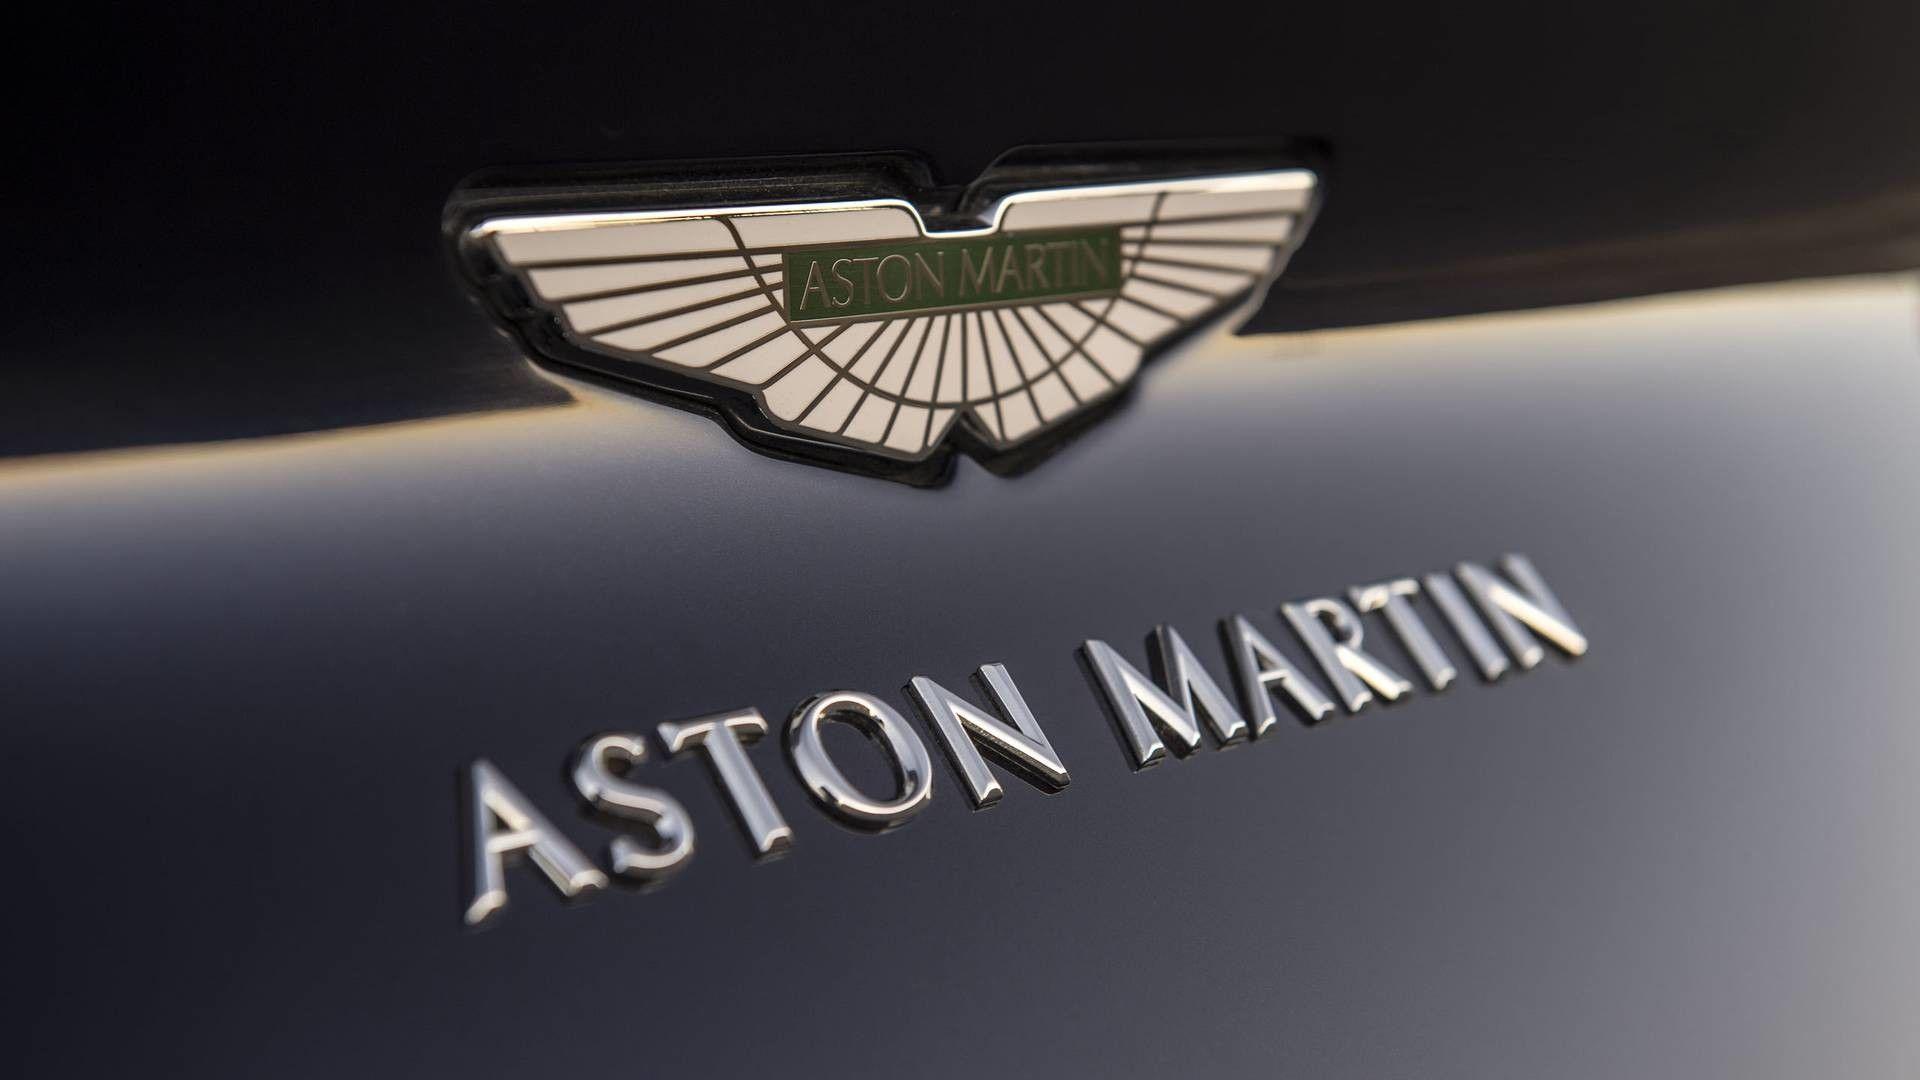 Aston Martin Logo Wallpapers Top Free Aston Martin Logo Backgrounds Wallpaperaccess